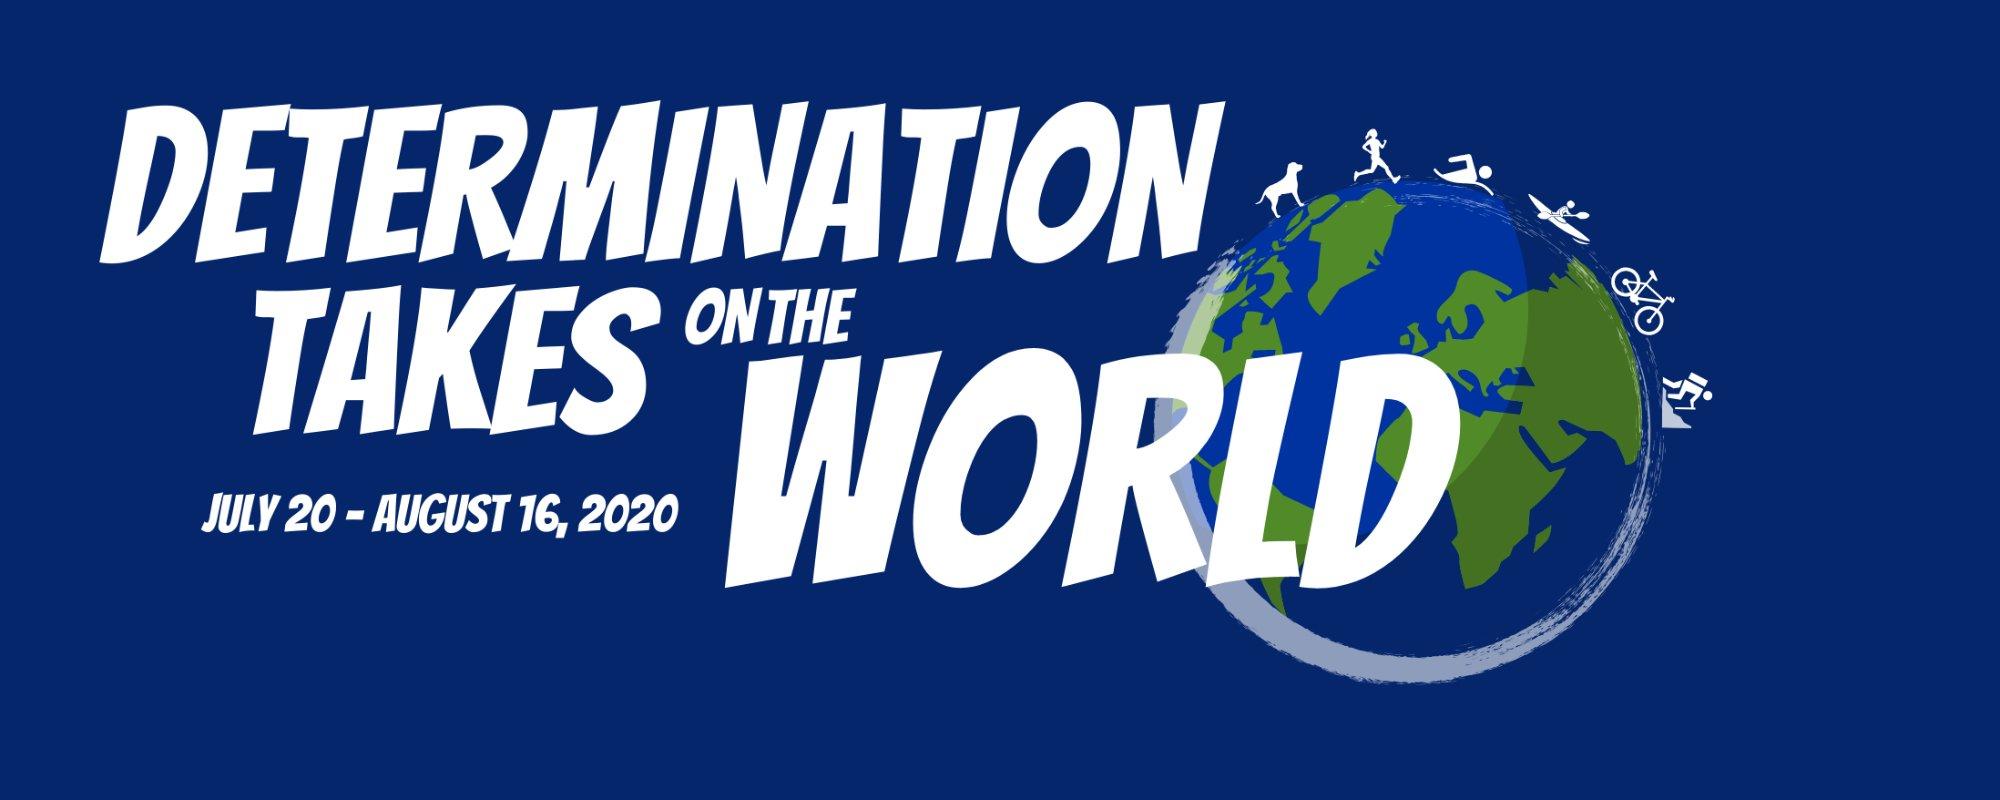 Determination Takes On The World